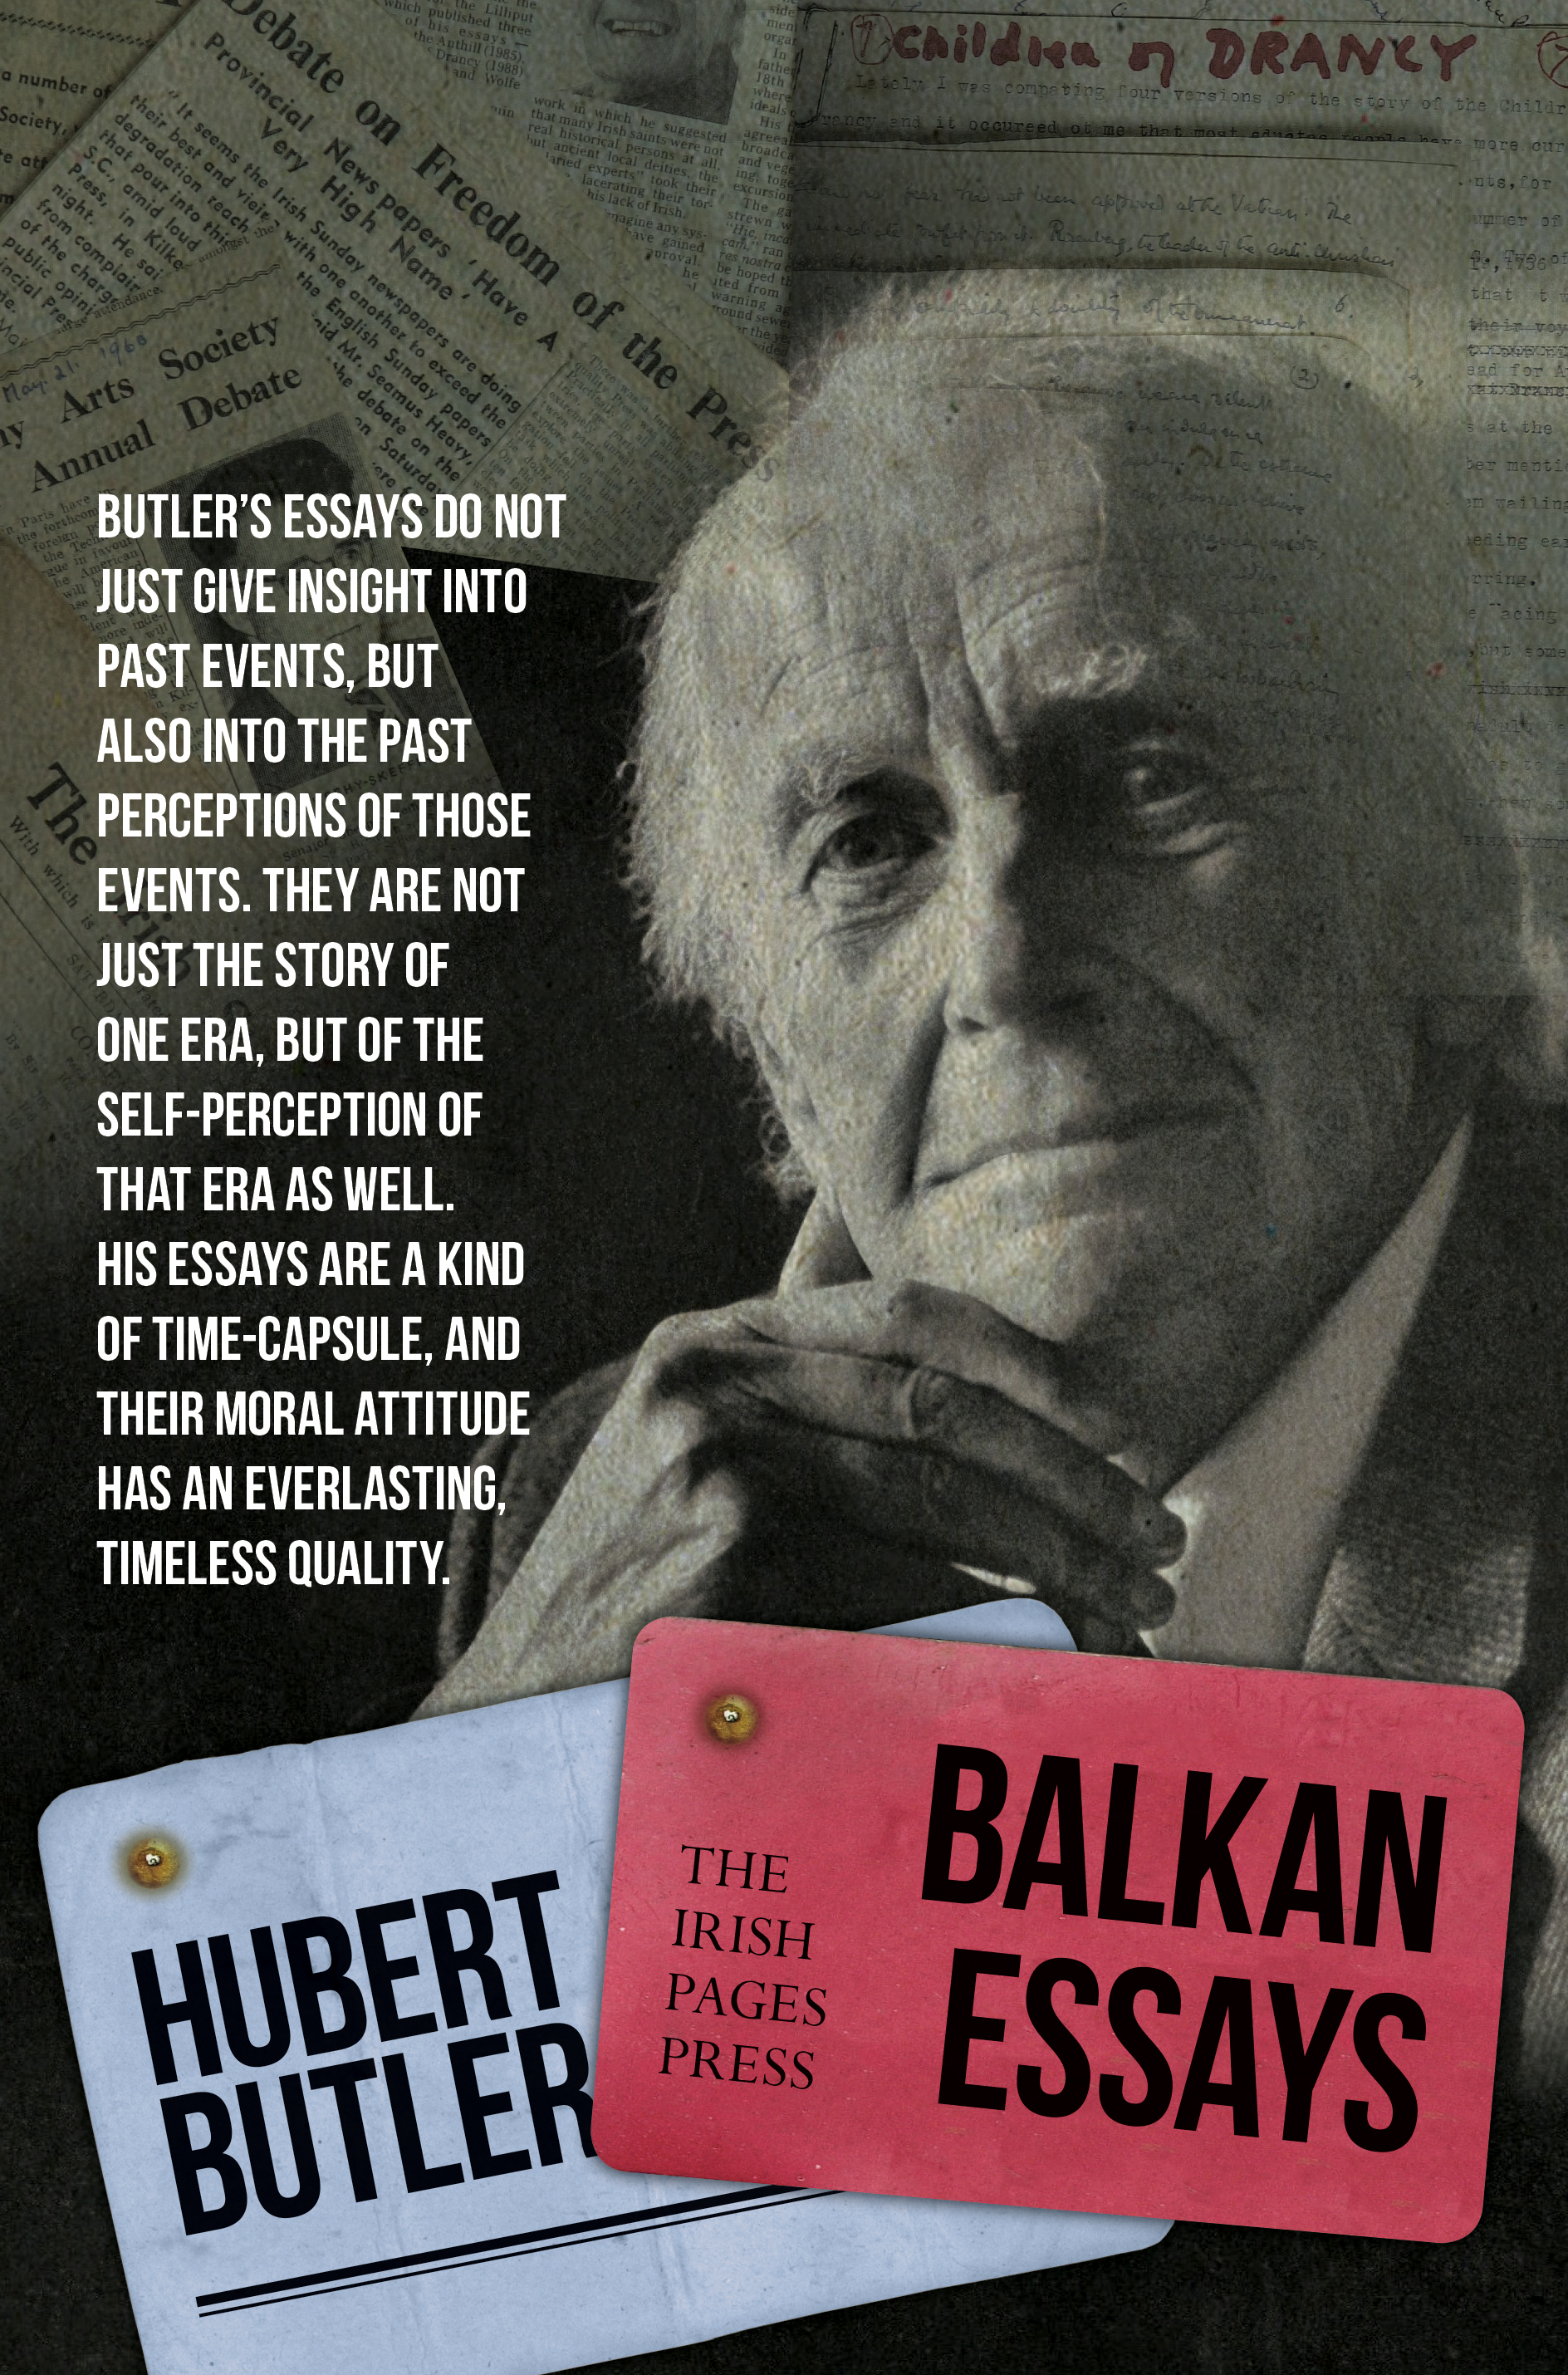 Balkan Essays